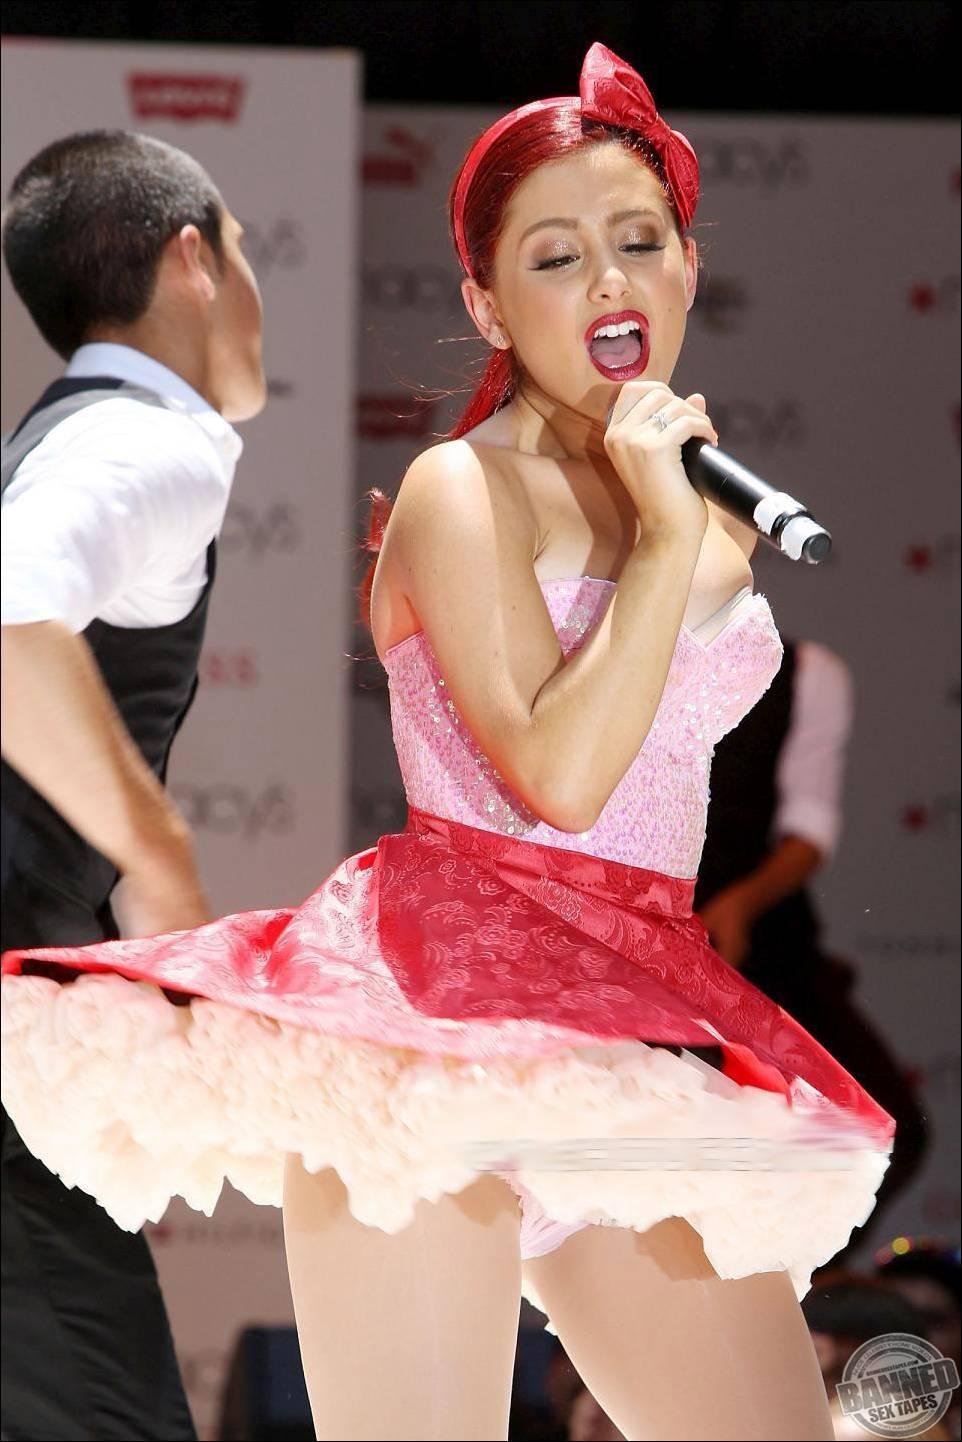 Ariana grande having sex